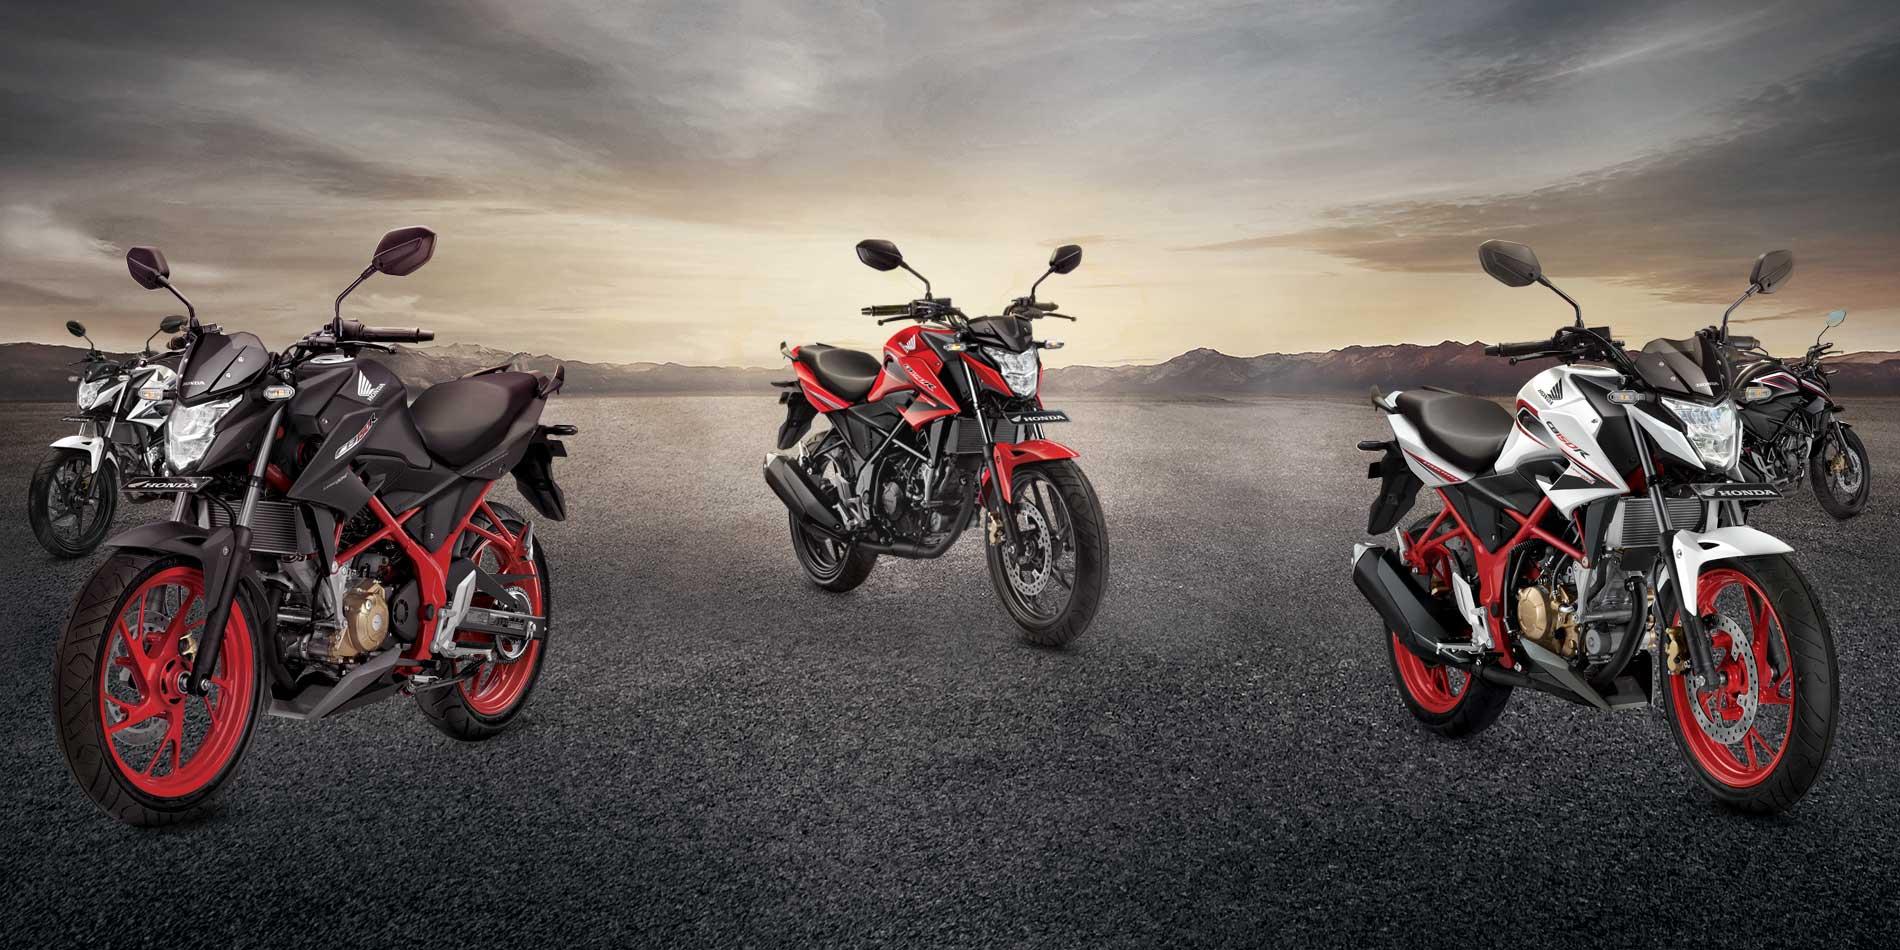 Foto Studio Honda New CB150R Special Edition Yang Hitam Doff Bikin